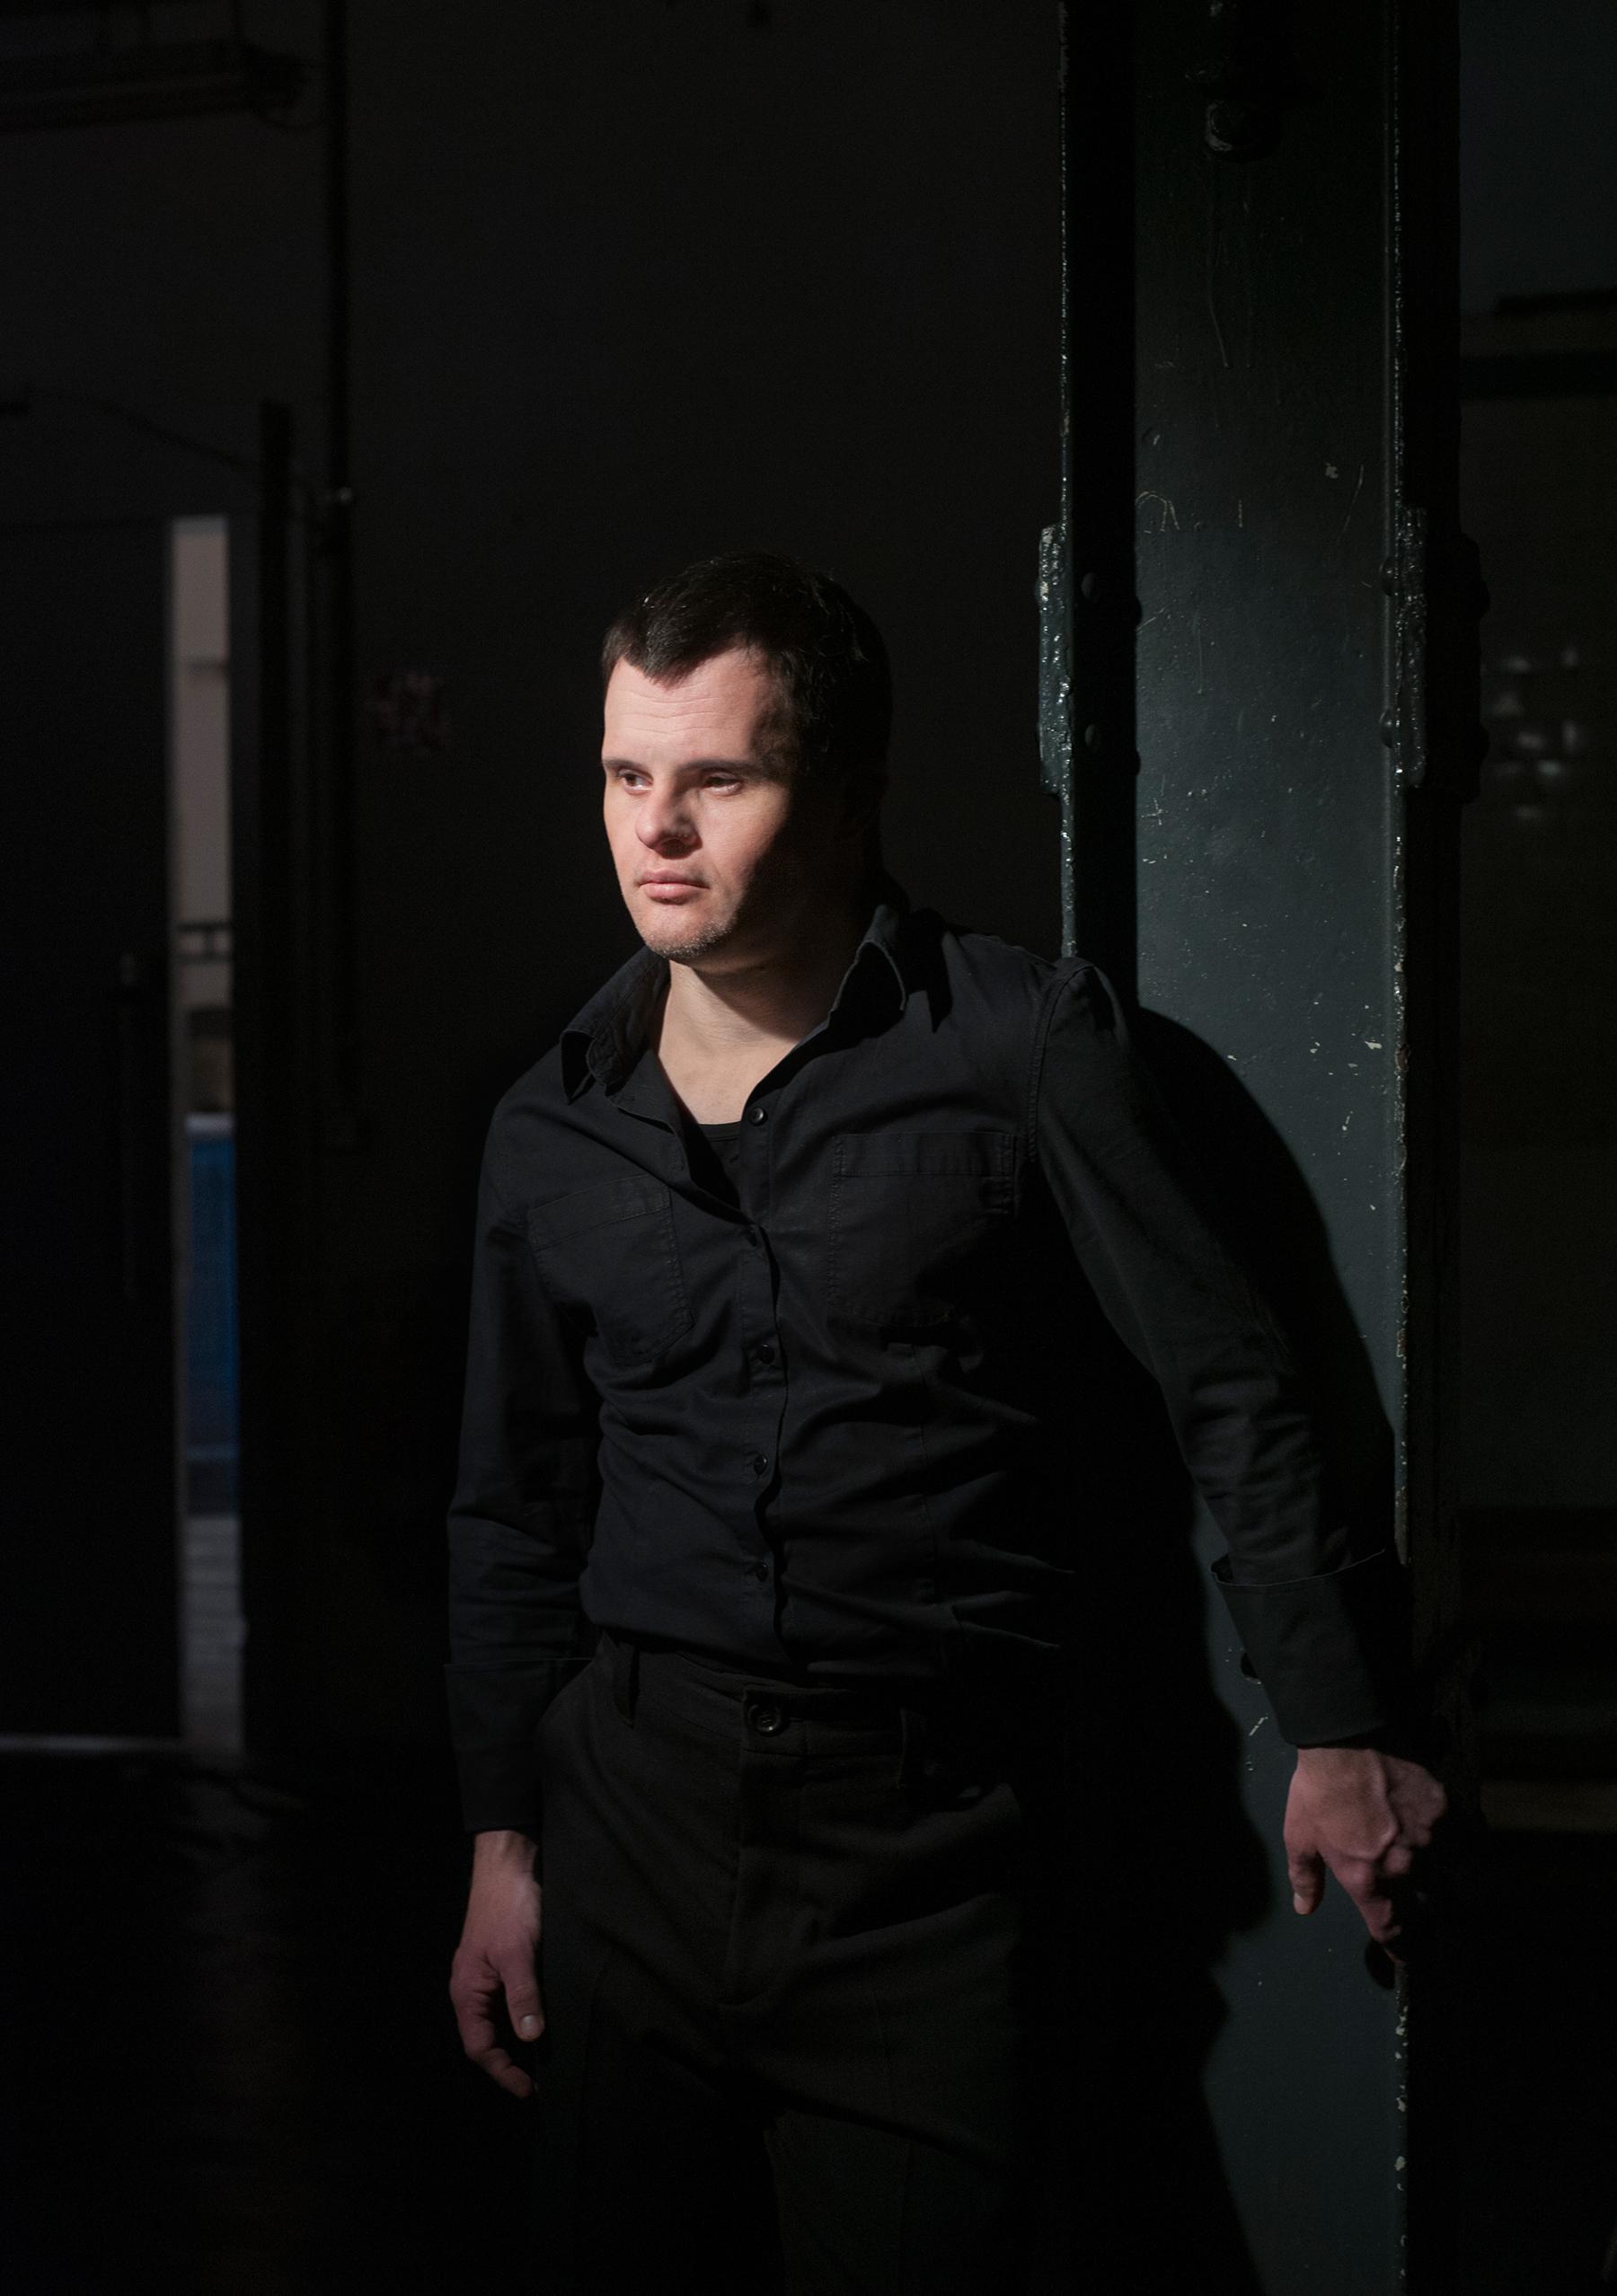 Sebastian Urbanski, 39 Jahre alt, ist Schauspieler. Foto: Jonas Ludwig Walter